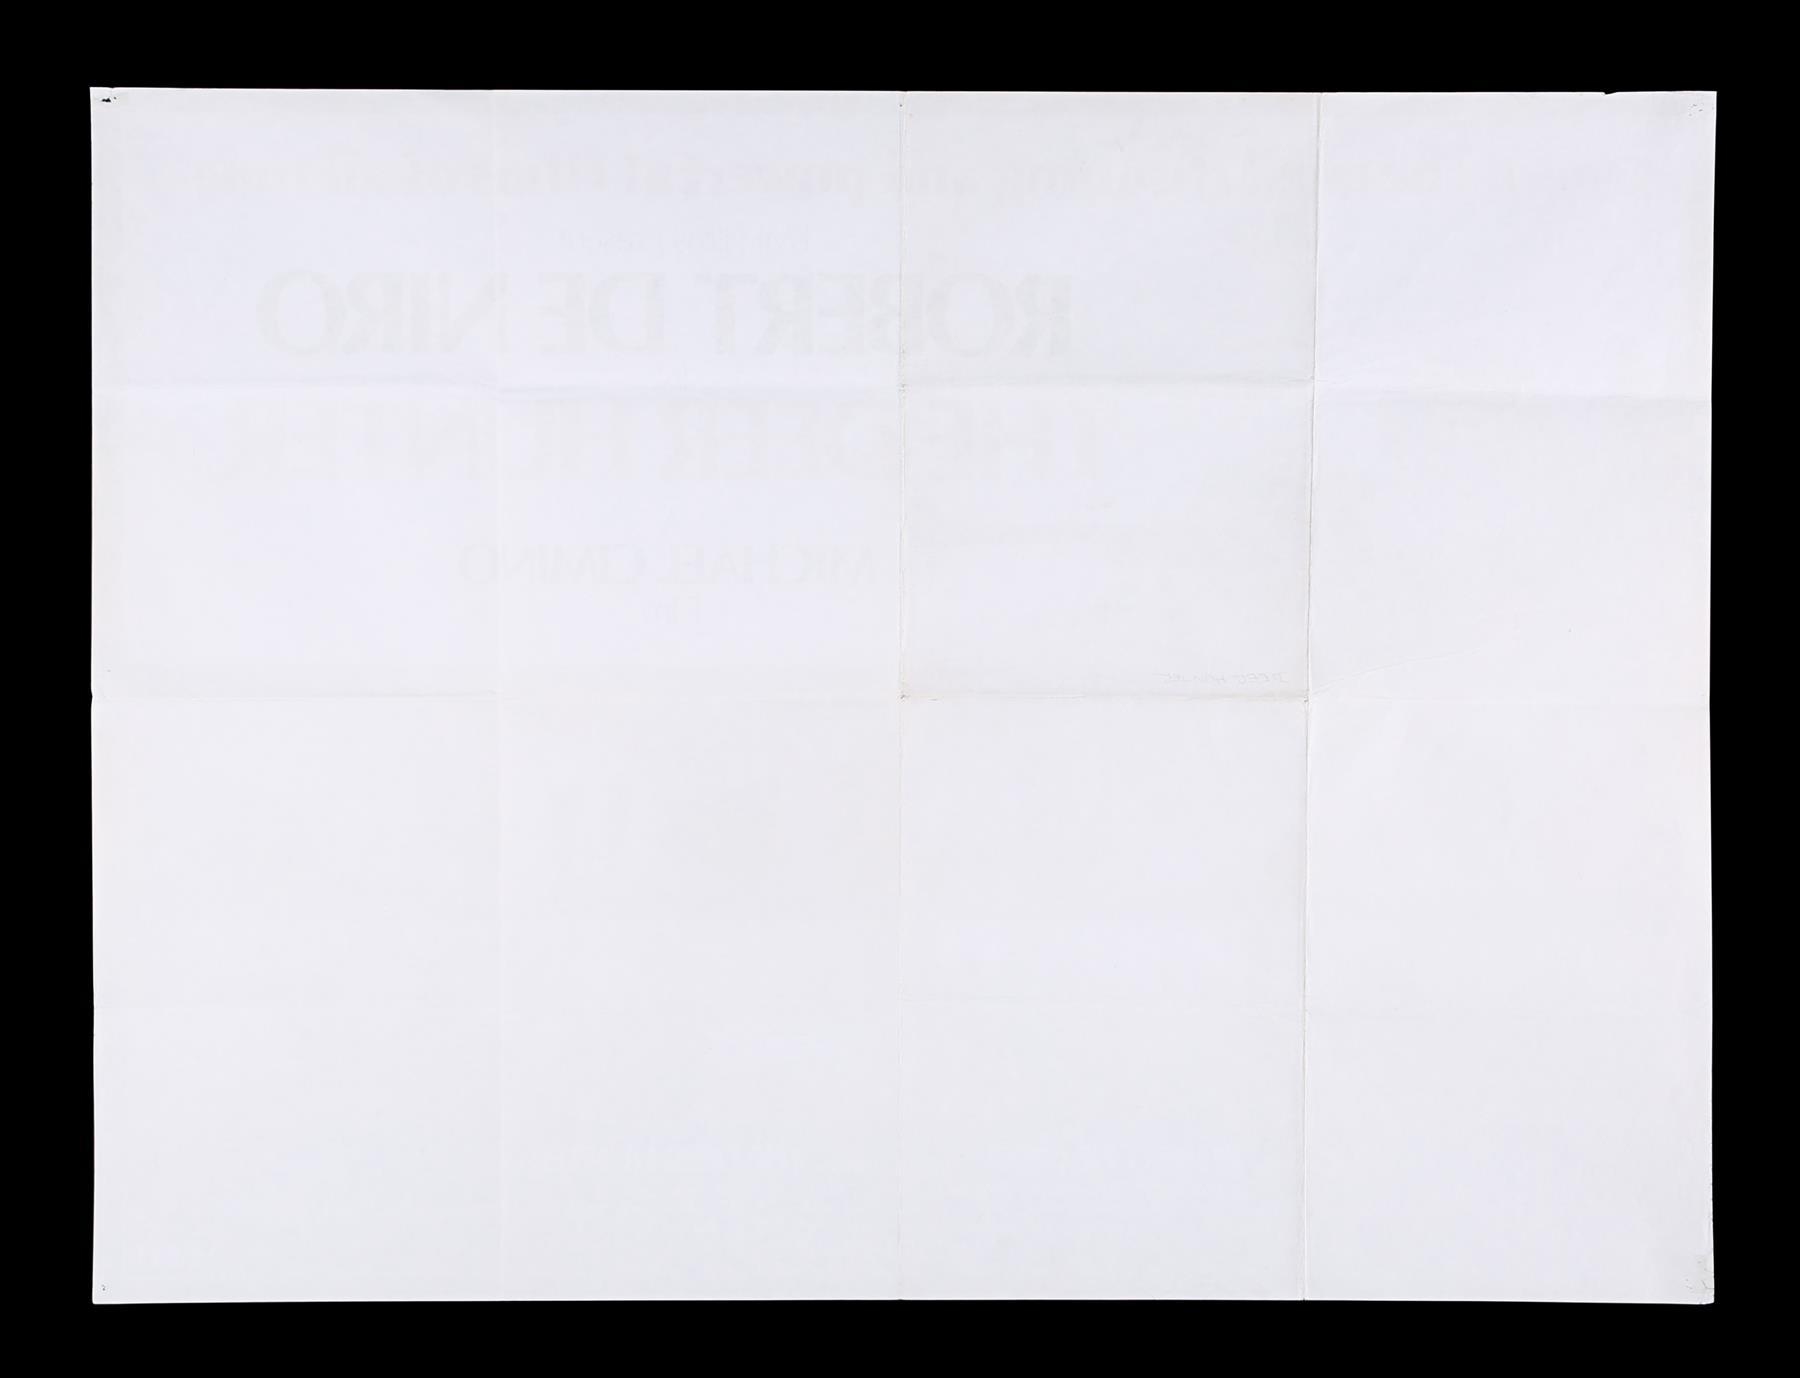 DEER HUNTER (1978), PLATOON (1986), RAGING BULL (1980) - Two UK Quads, US One-Sheet, 1978, 1980, 198 - Image 5 of 7